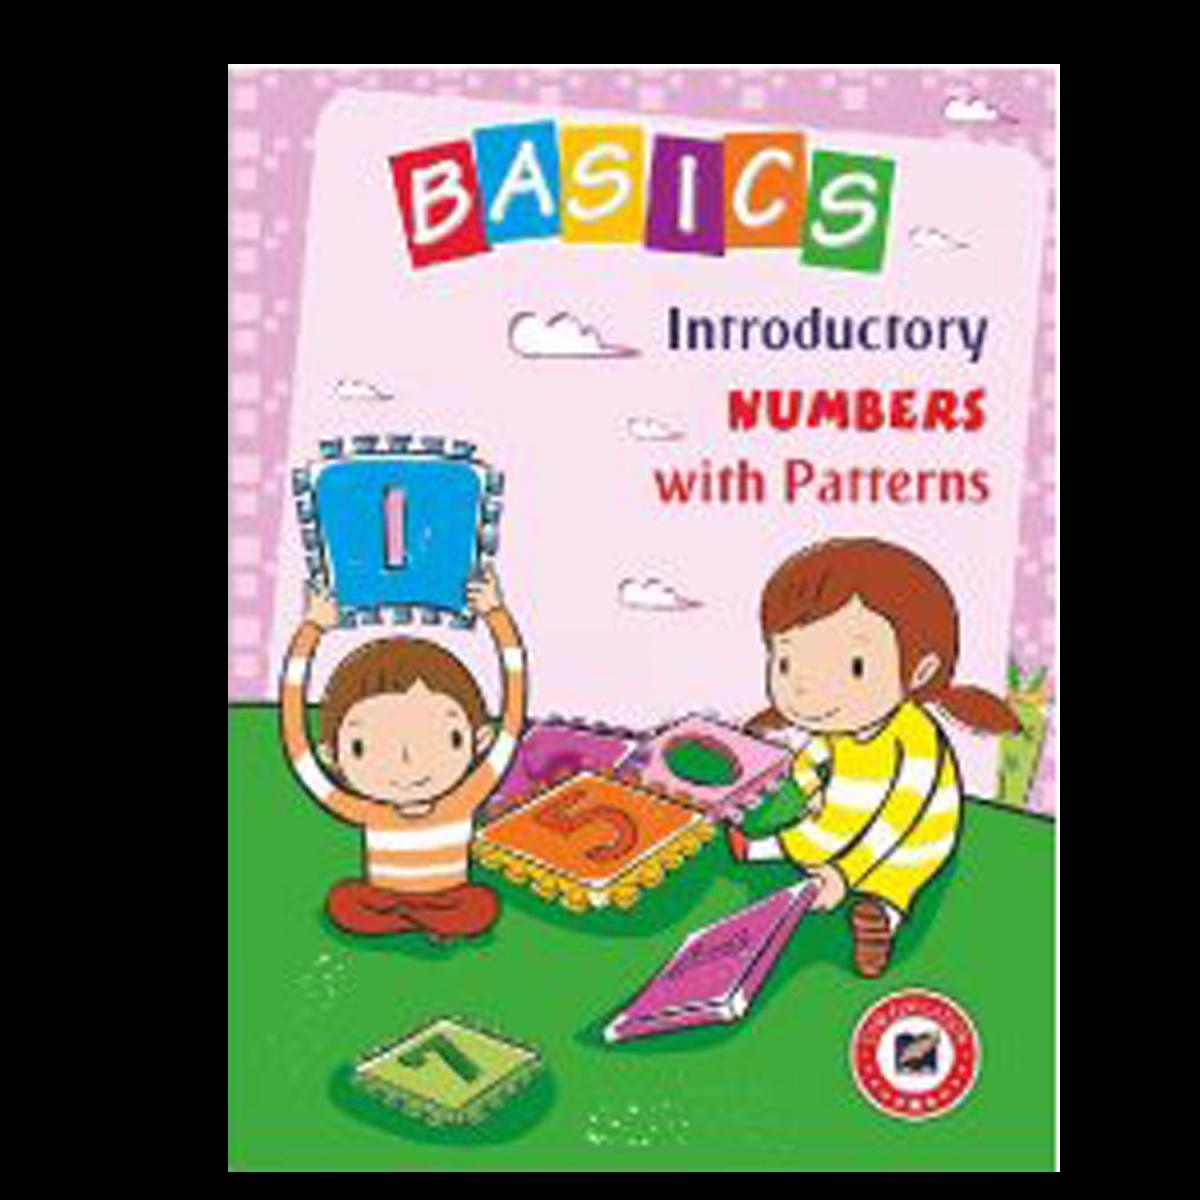 Basics Introductory Alphabet (lines)